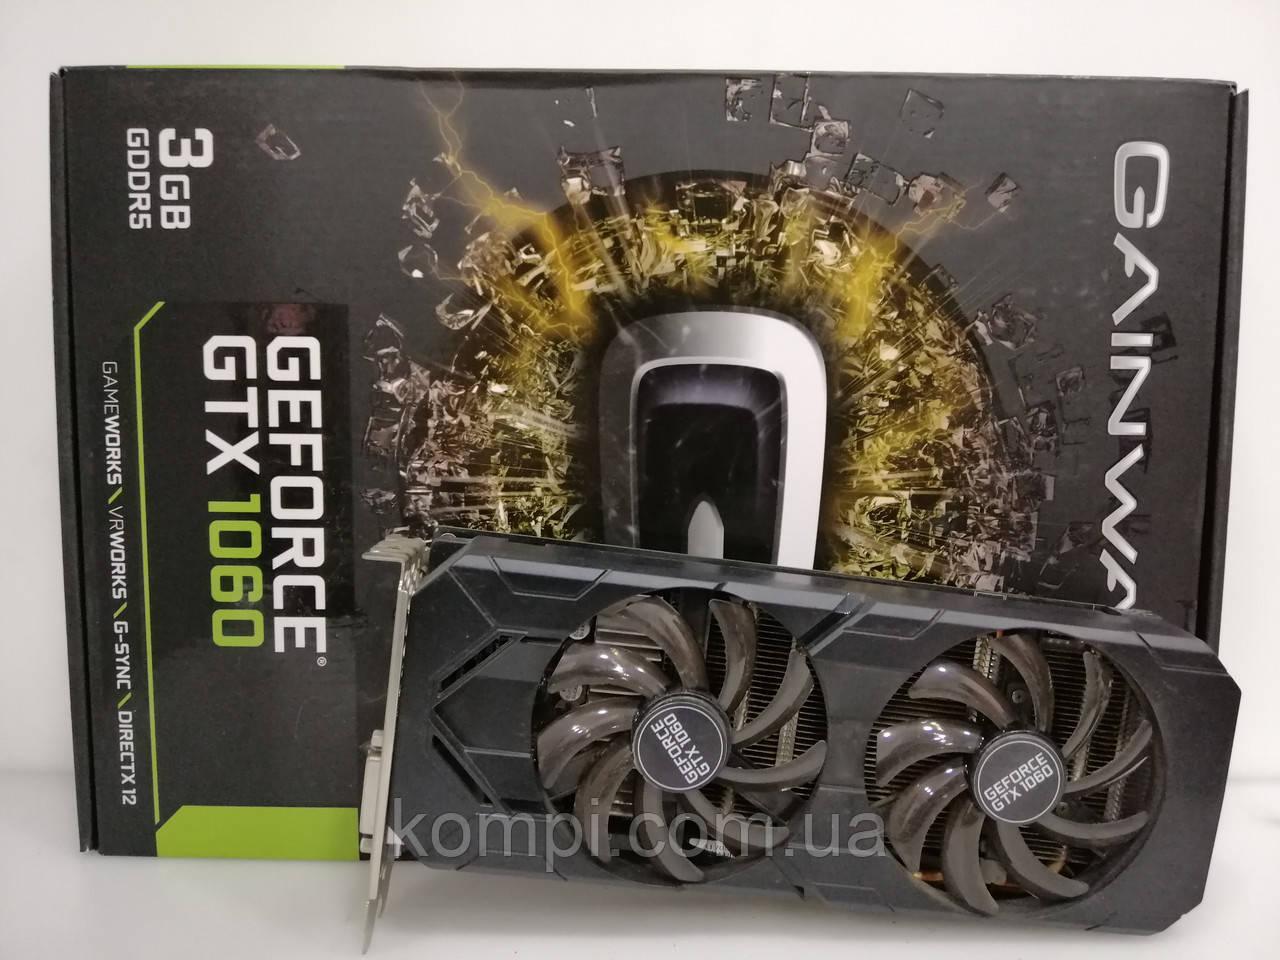 Видеокарта Nvidia GTX 1060 3Gb  Gainward / Майнинг